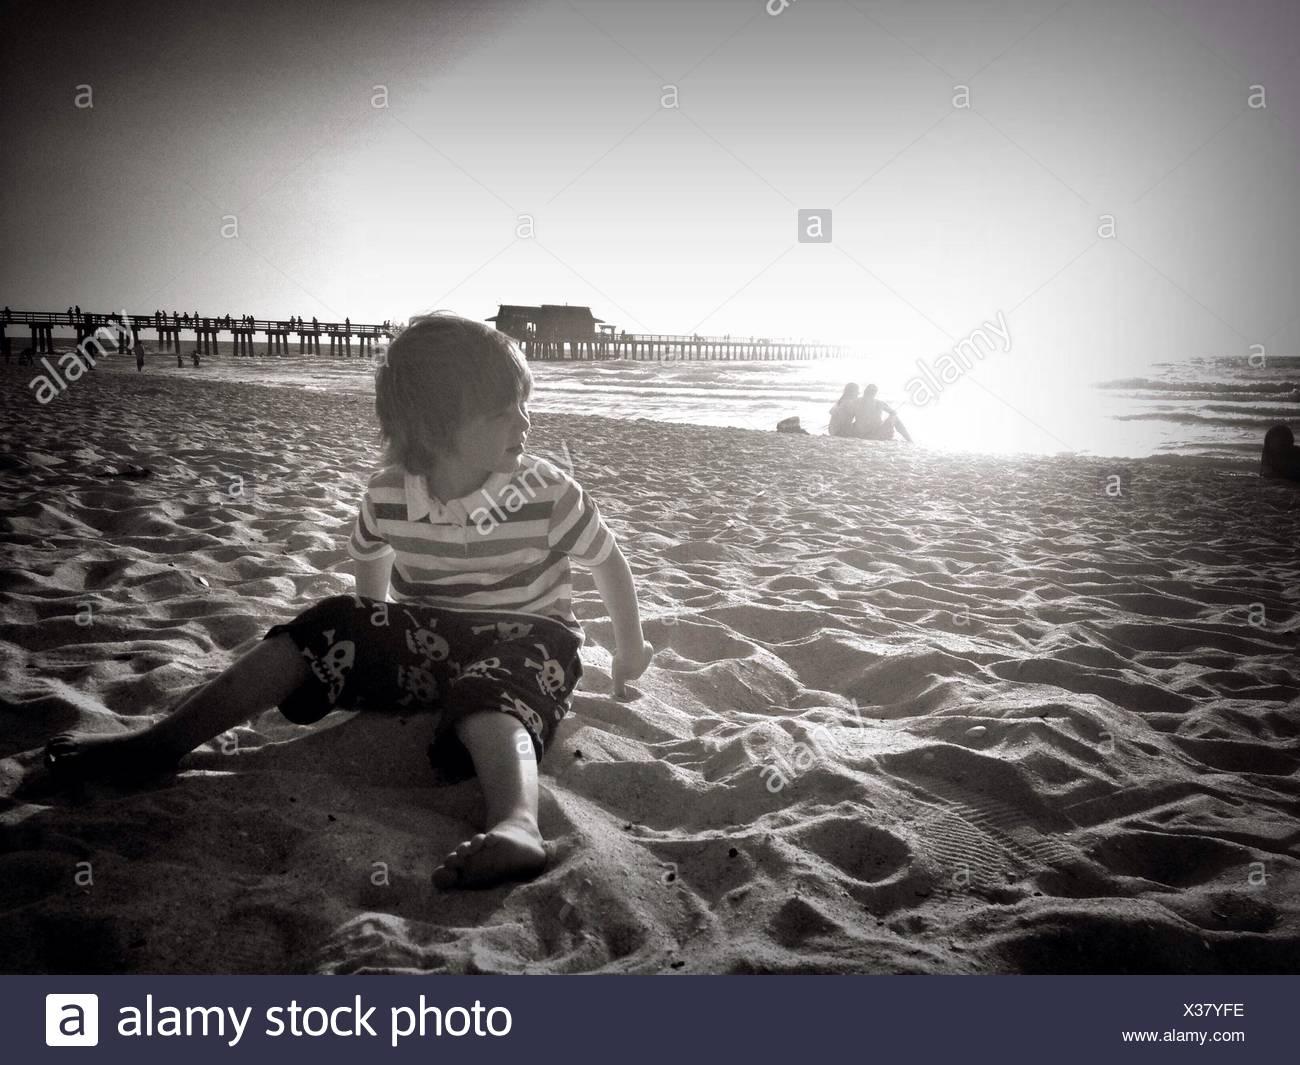 Junge sitzt am Strand Stockbild